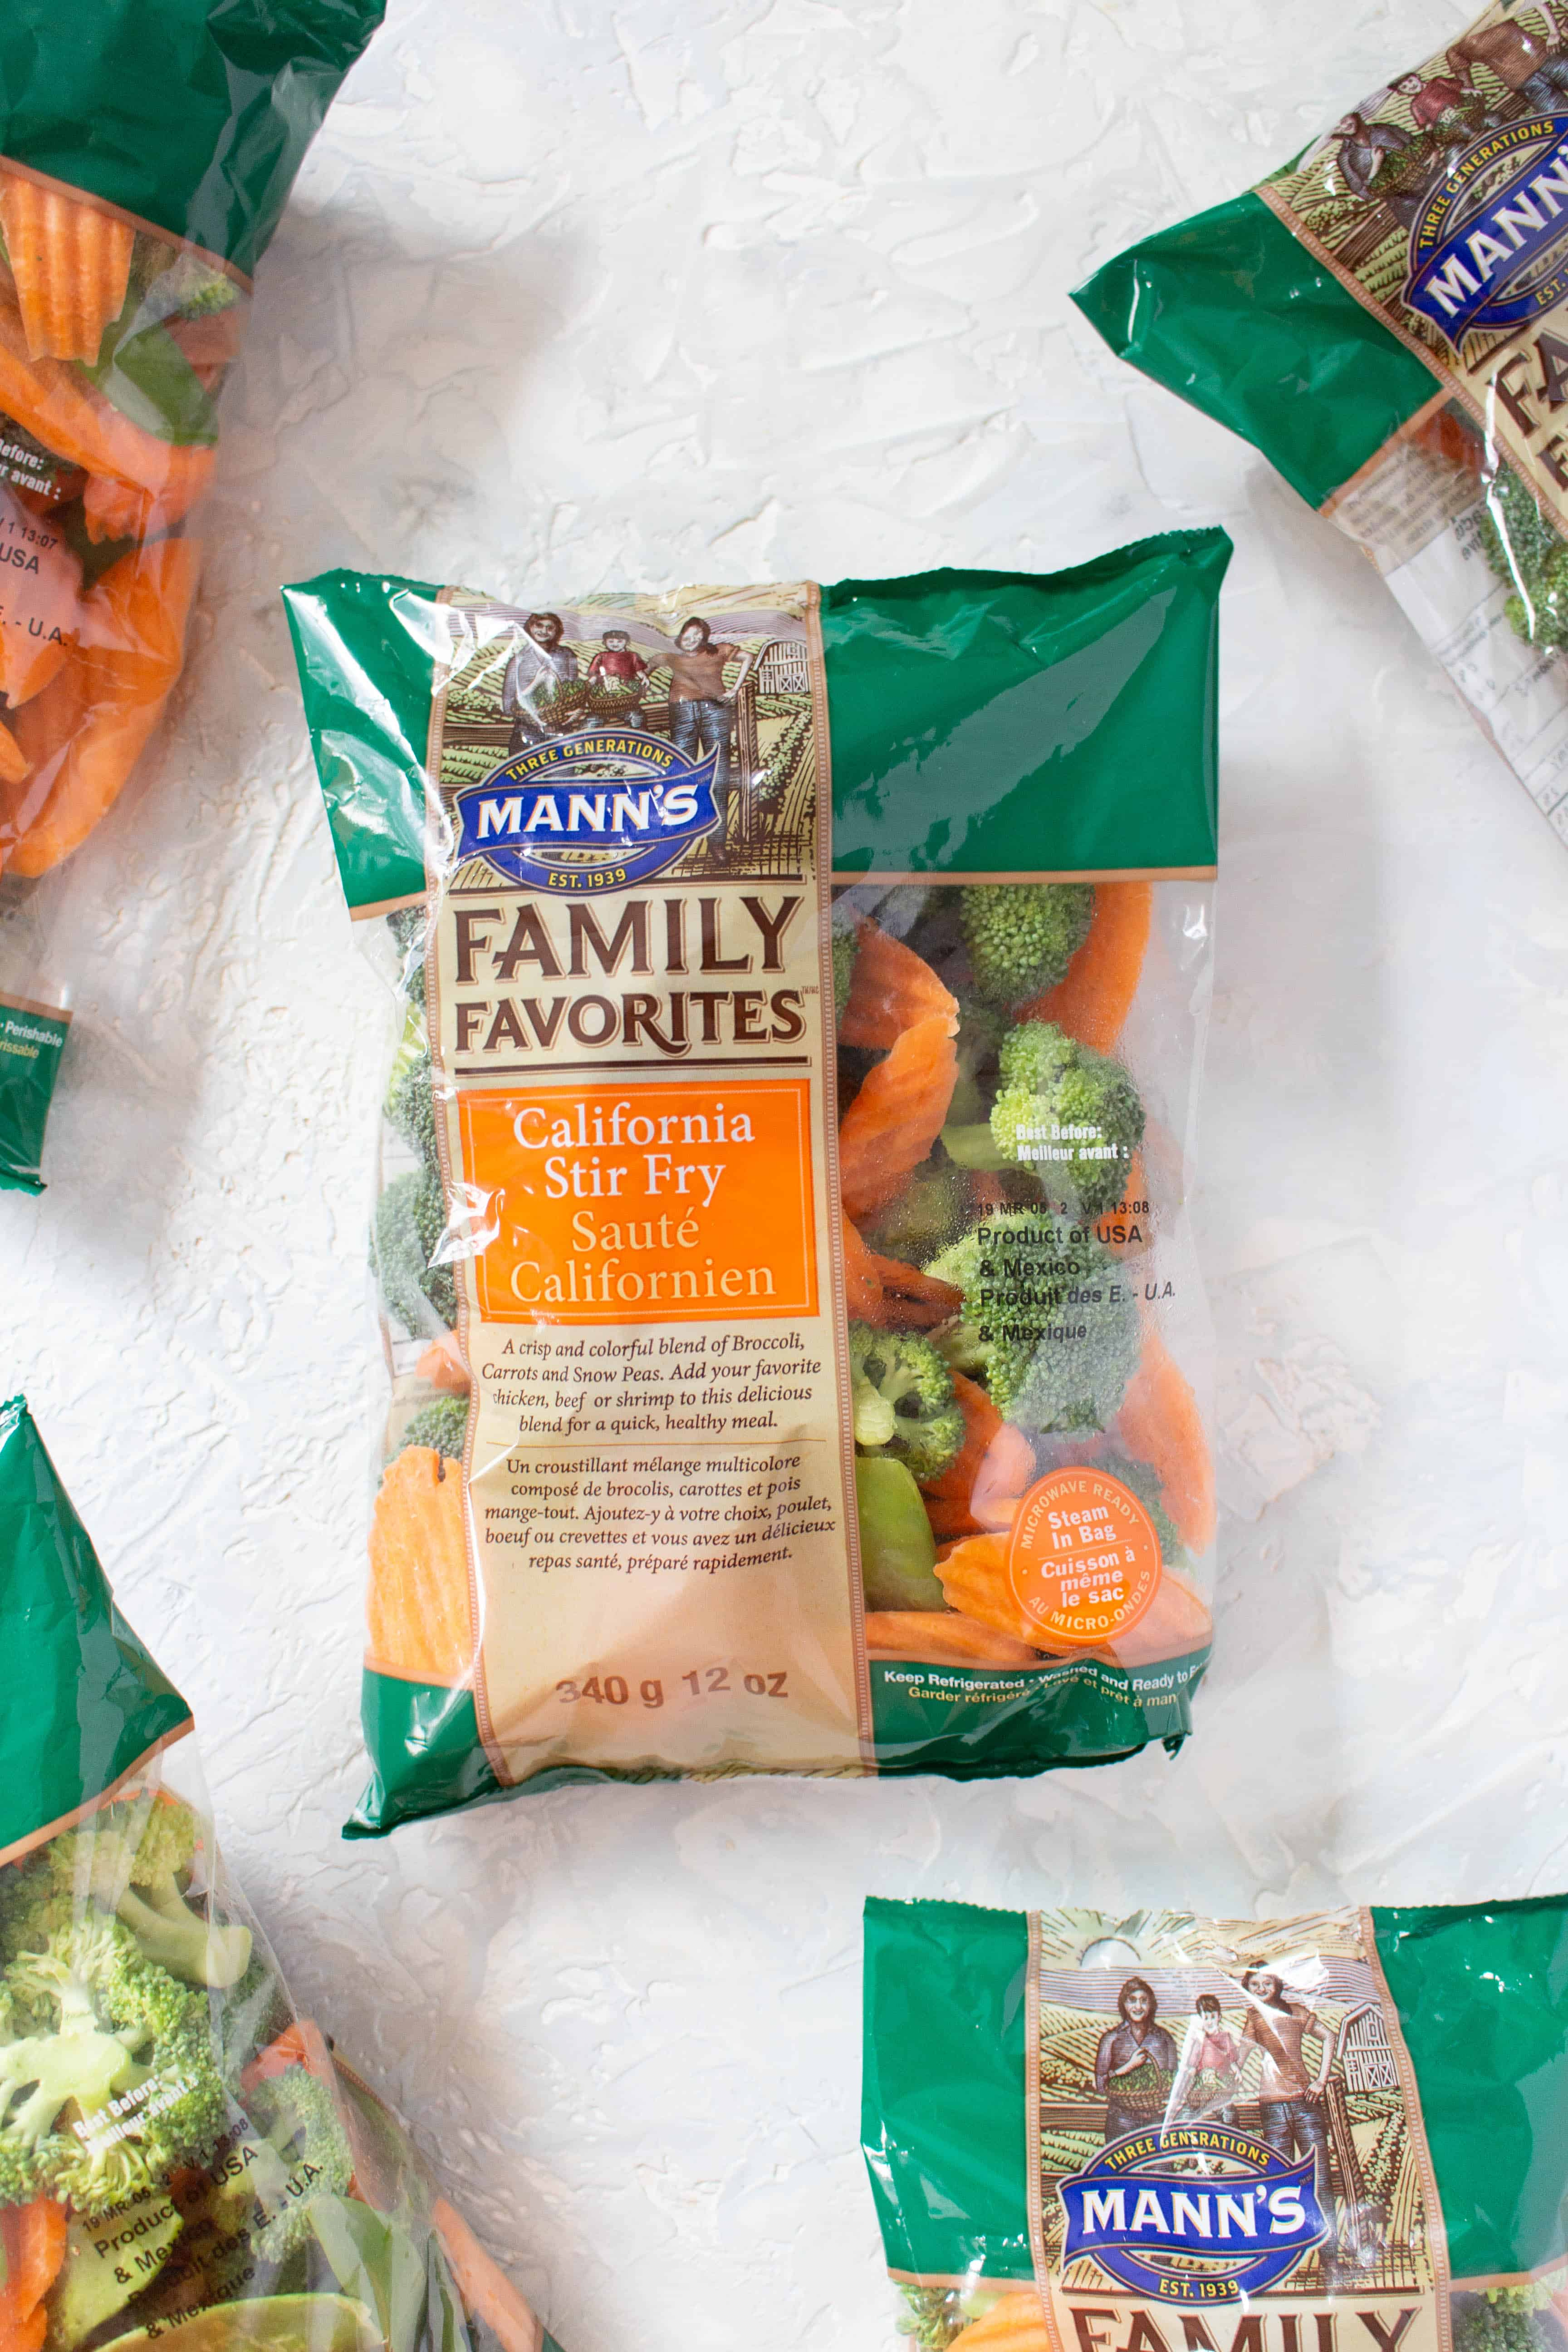 how to use Mann's Fresh Vegetables' California Stir Fry